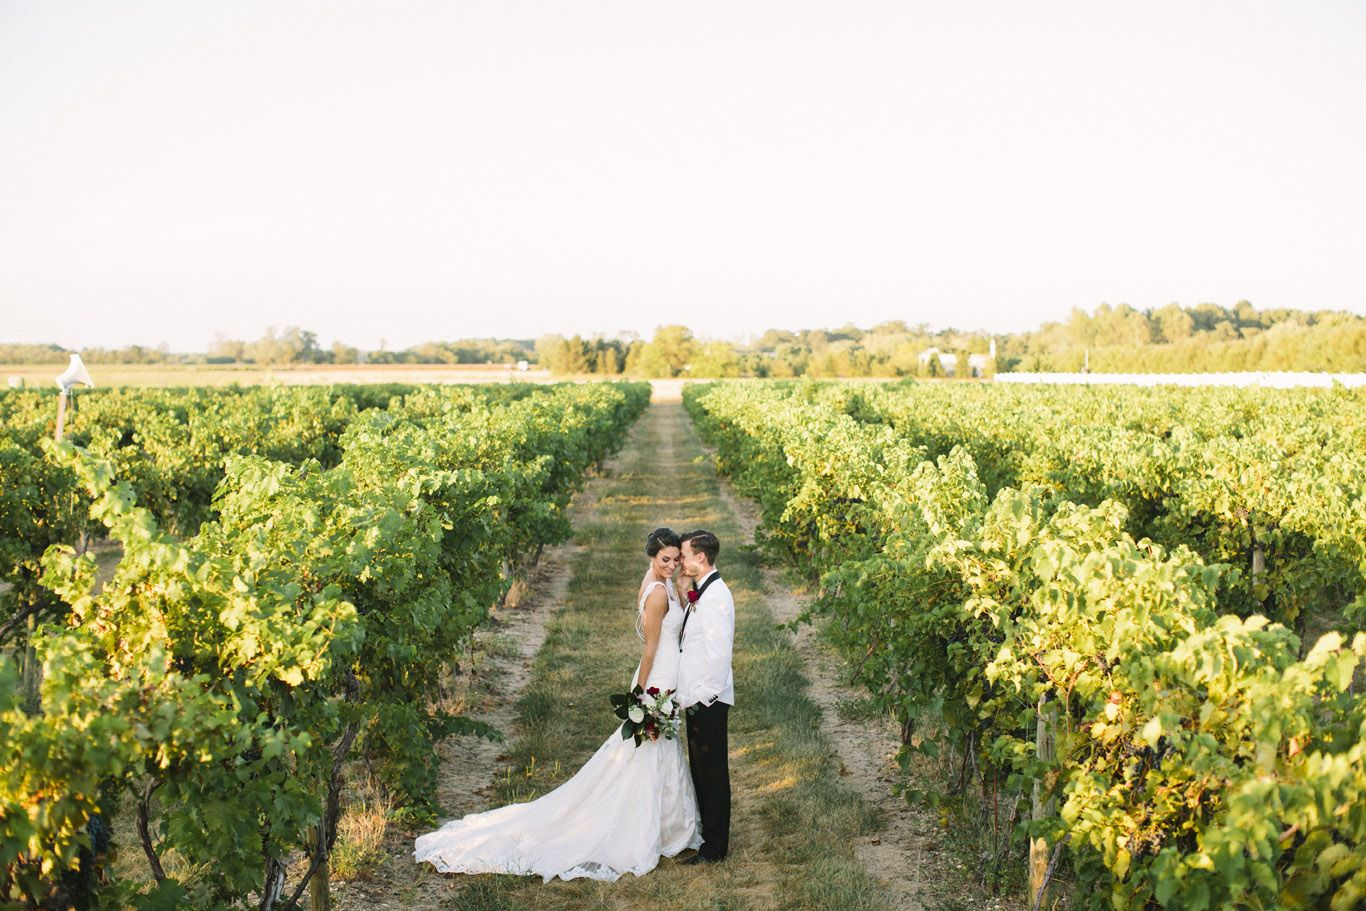 Tomasello winery vineyard photo credit saltwater studio